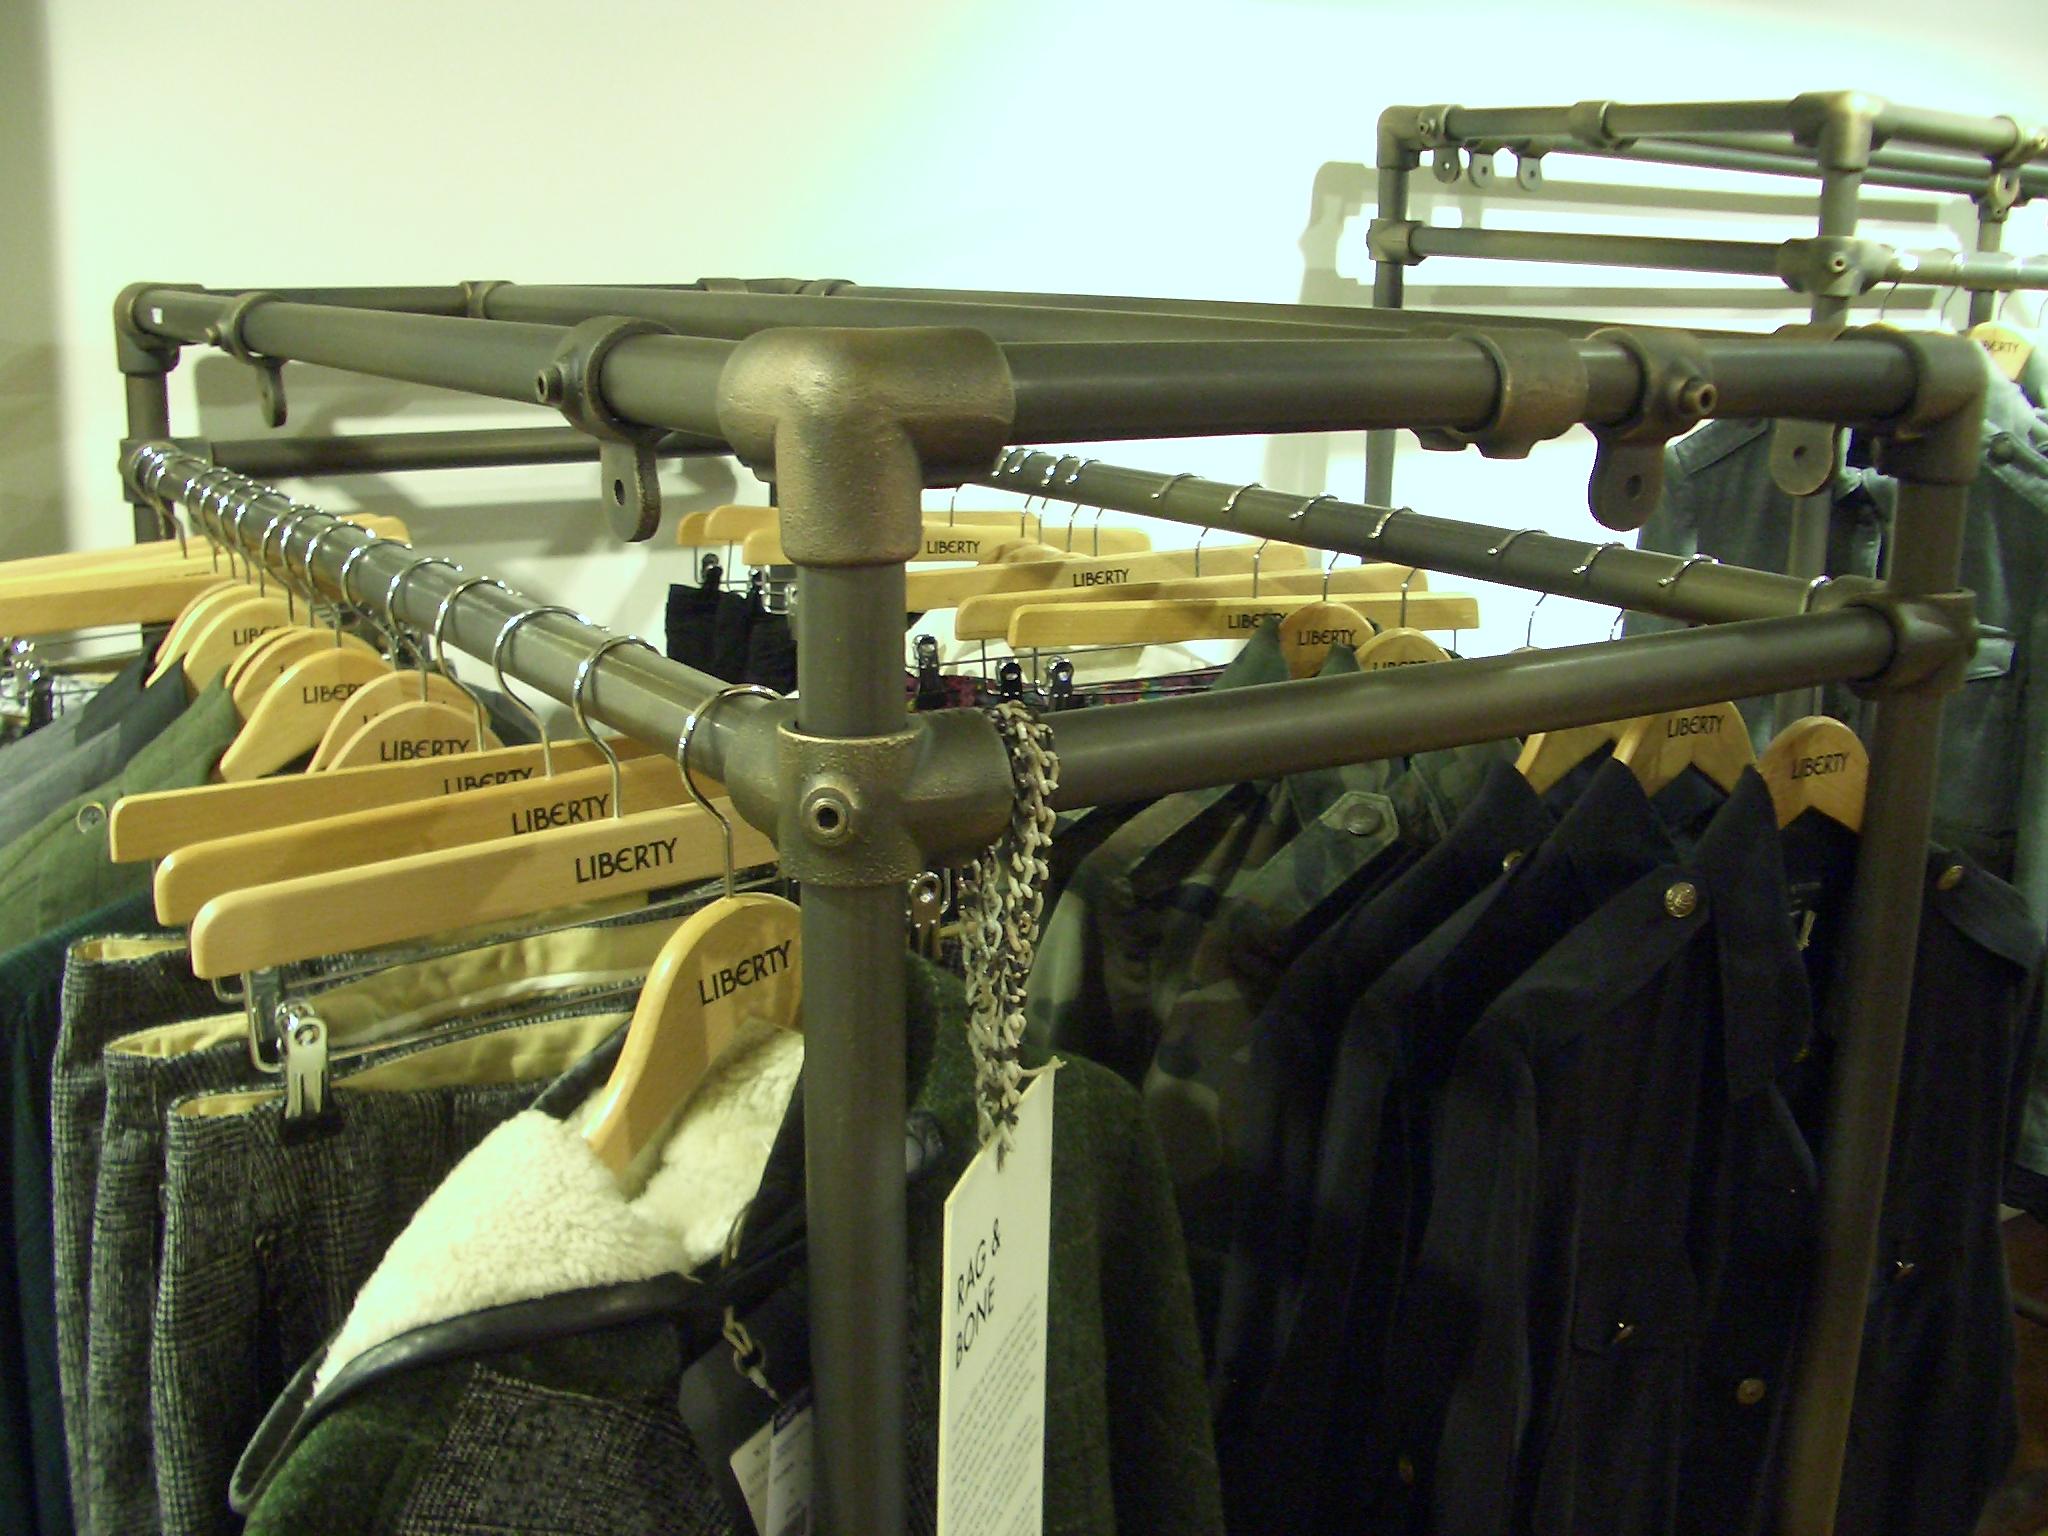 Kee_Klamp_Clothes_Rails.JPG